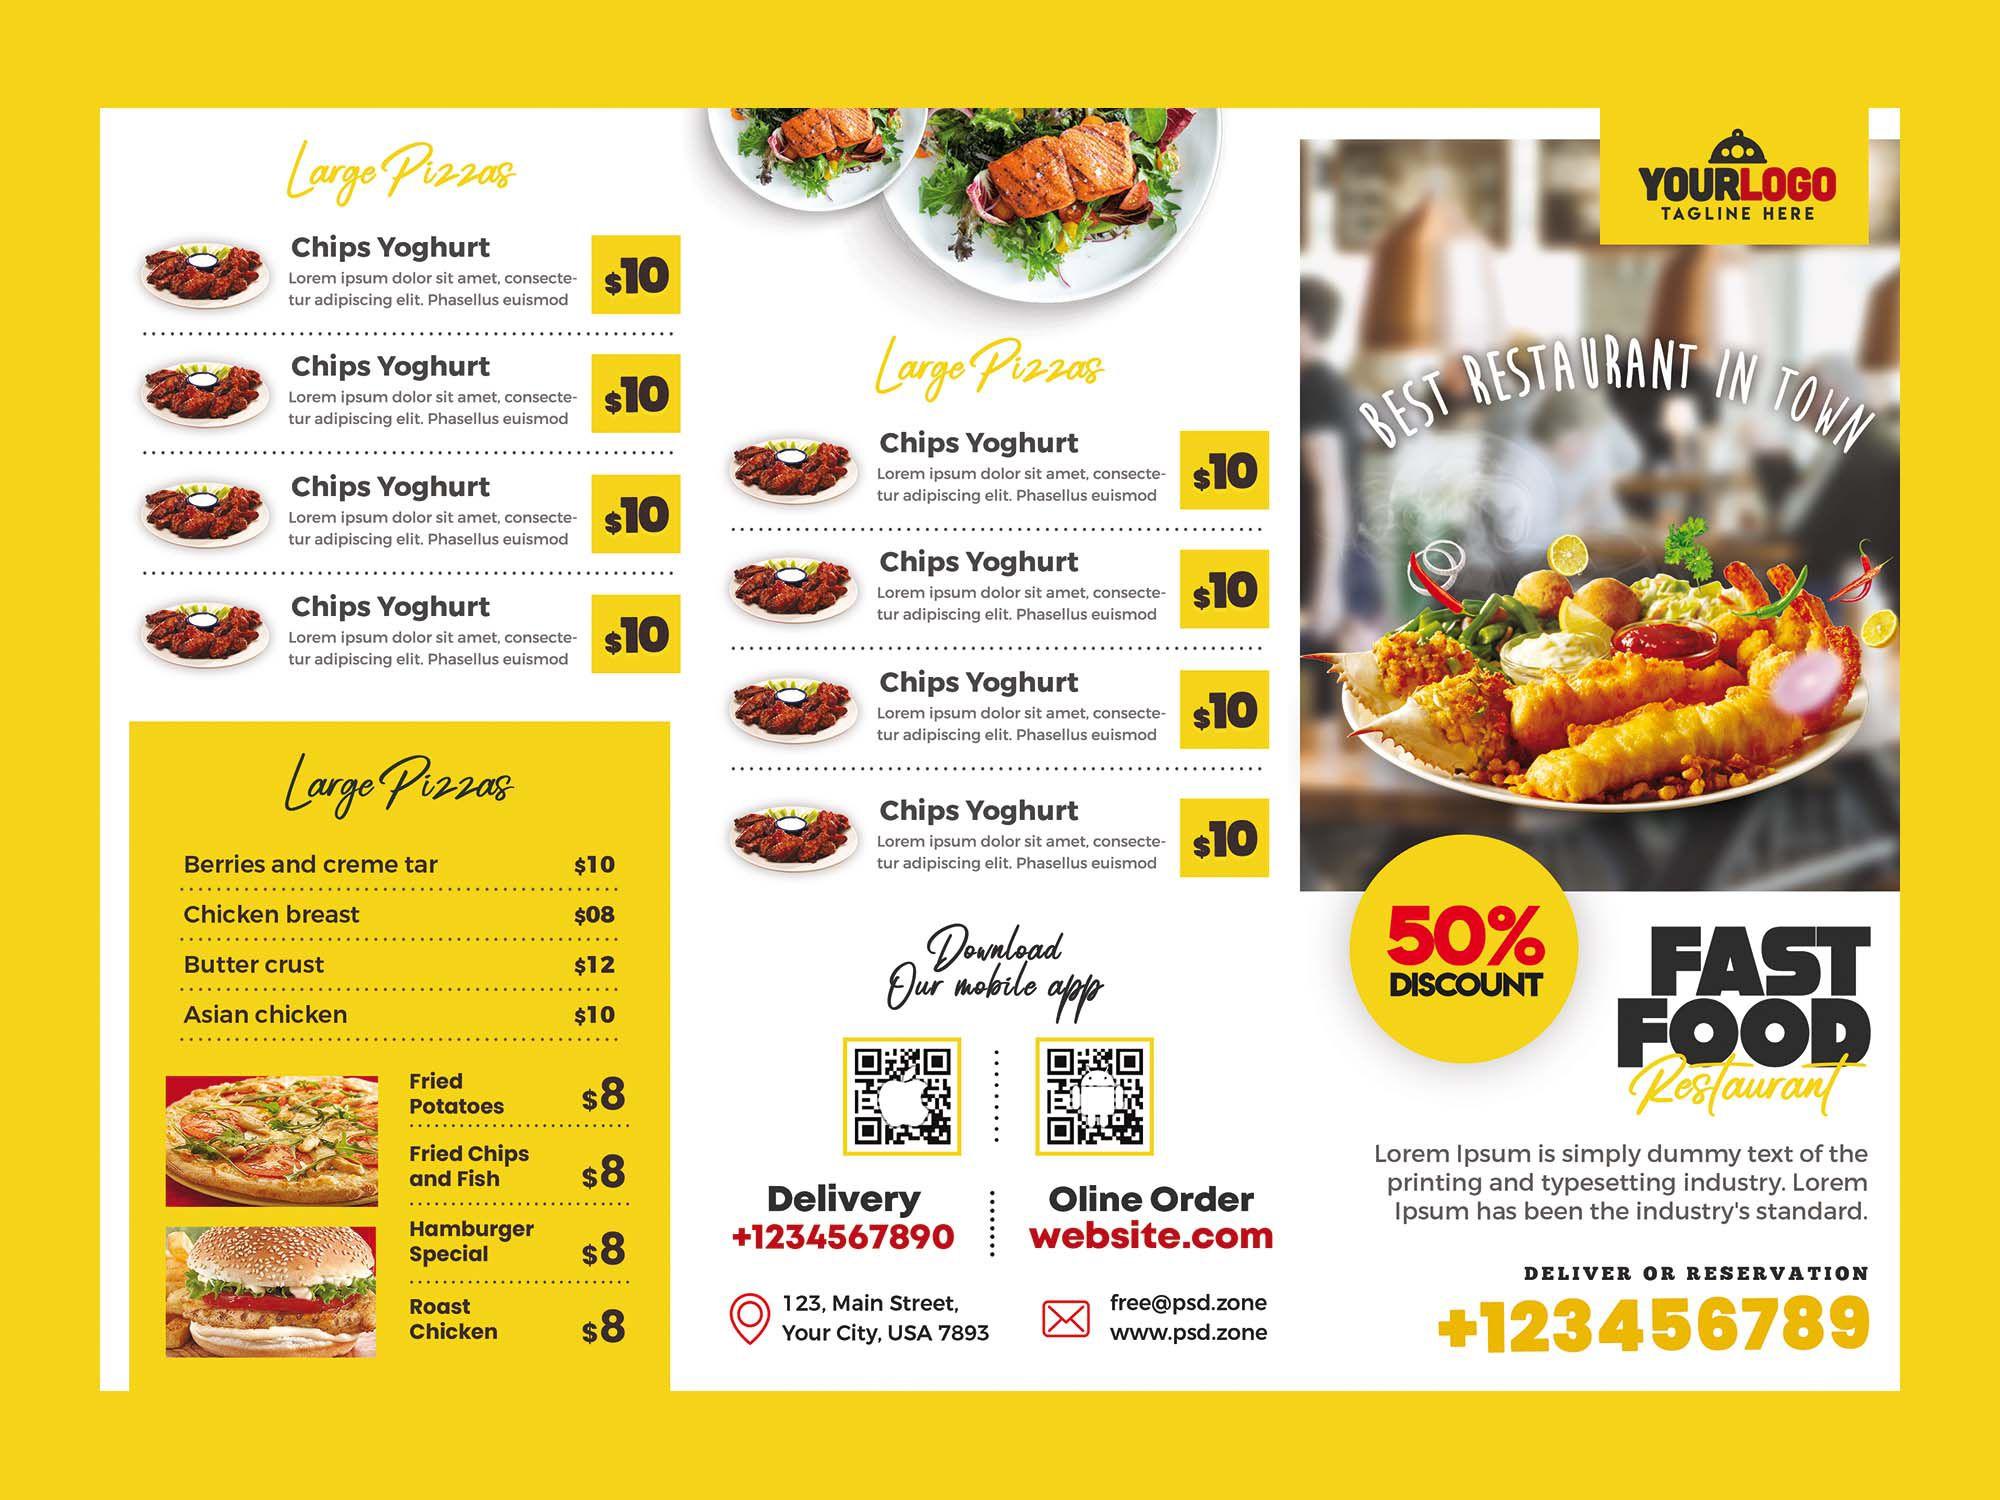 004 Archaicawful Tri Fold Menu Template Image  Templates Restaurant Tri-fold Food Free PsdFull